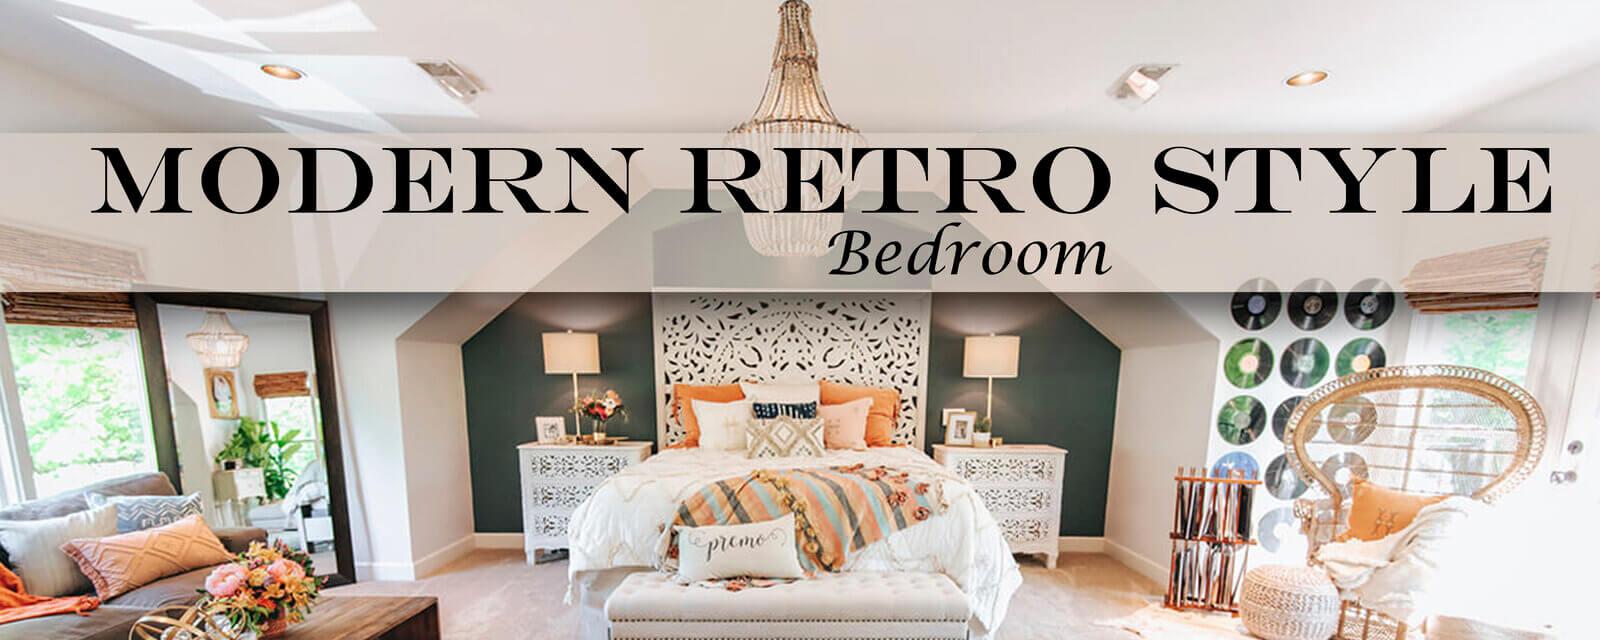 Modern Retro Style | Bedroom